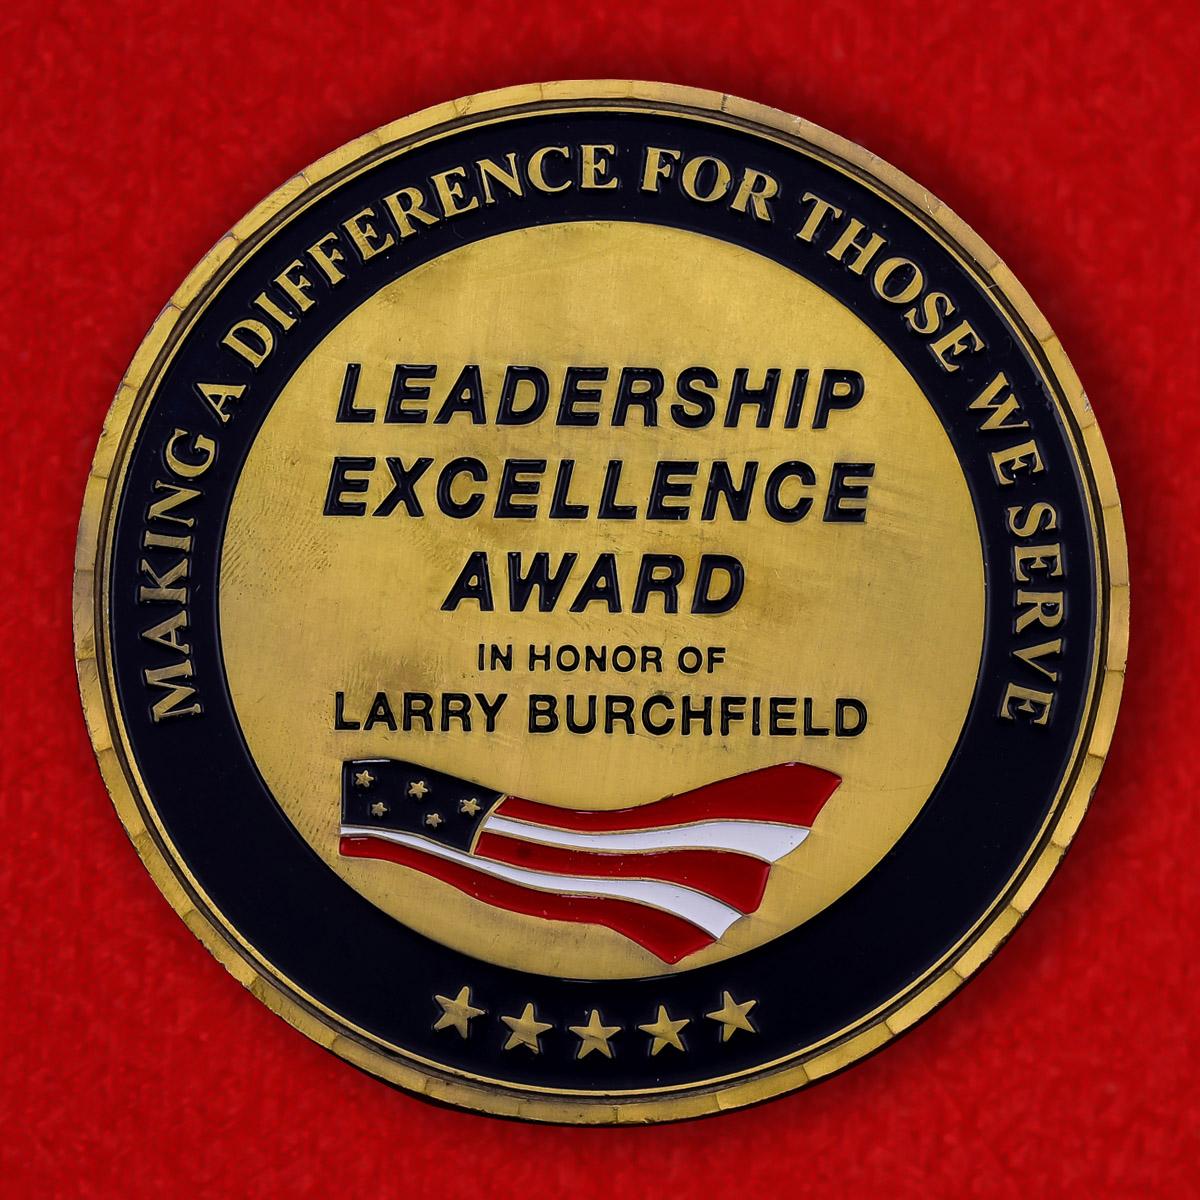 "Челлендж коин ""От руководства Excellence Avard Ларри Бейчфилду"""